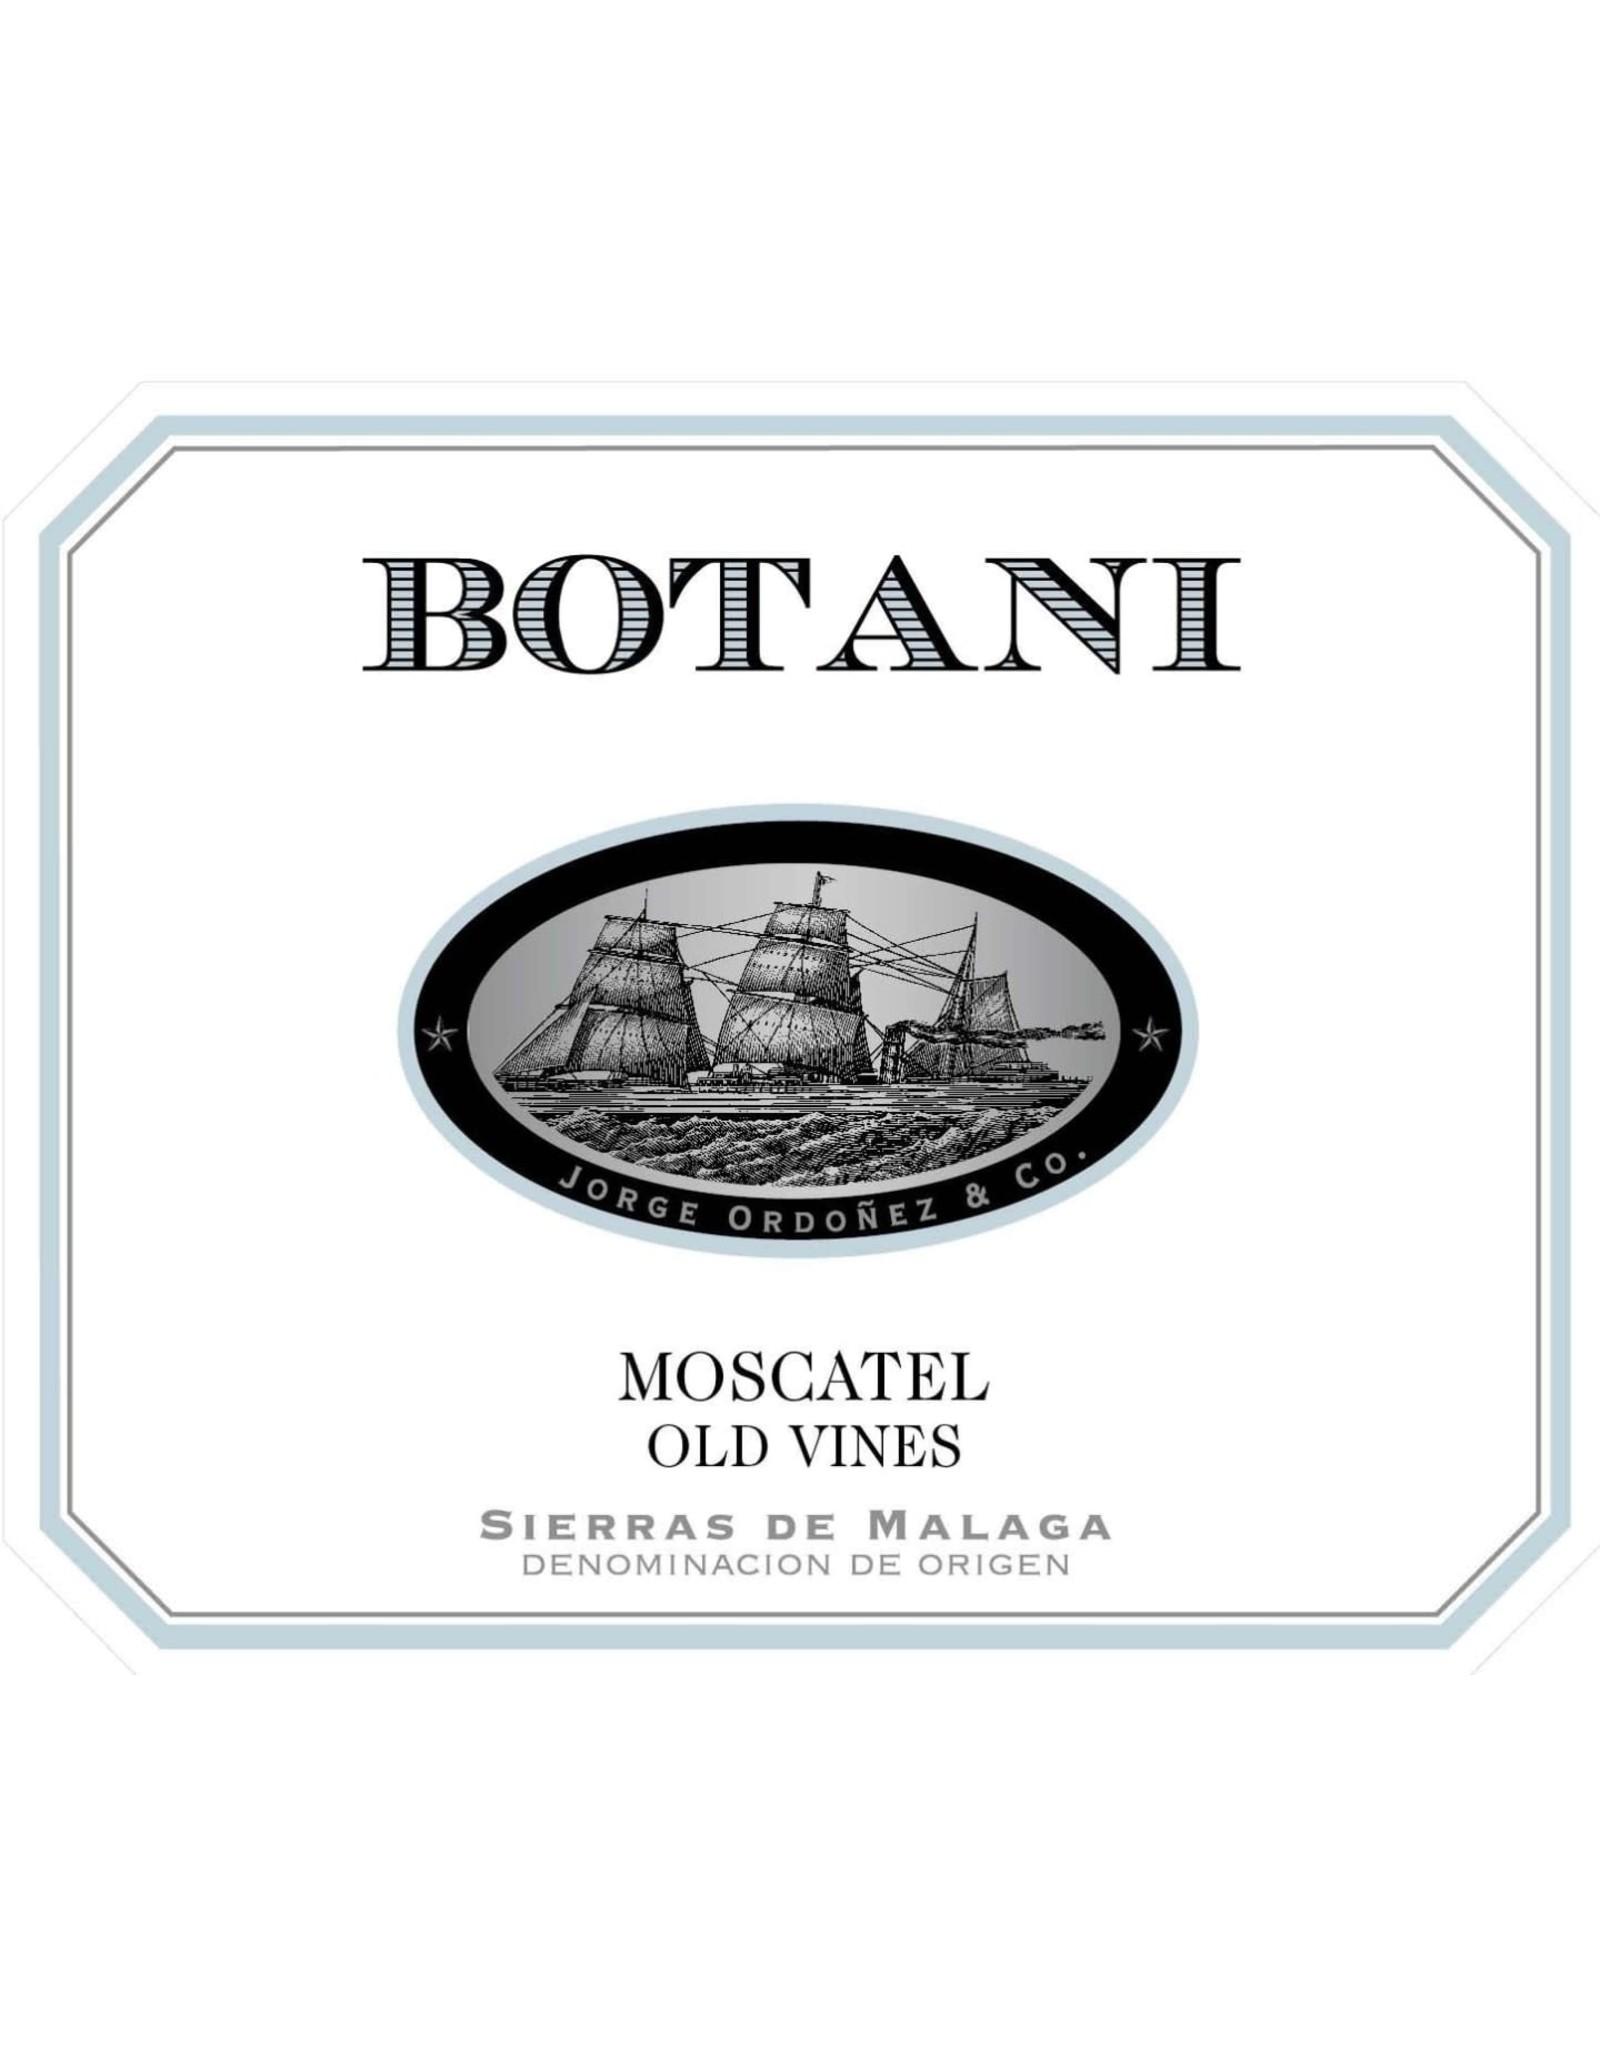 Jorge Ordóñez Botani Old Vine Moscatel, Sierras de Malaga 2017